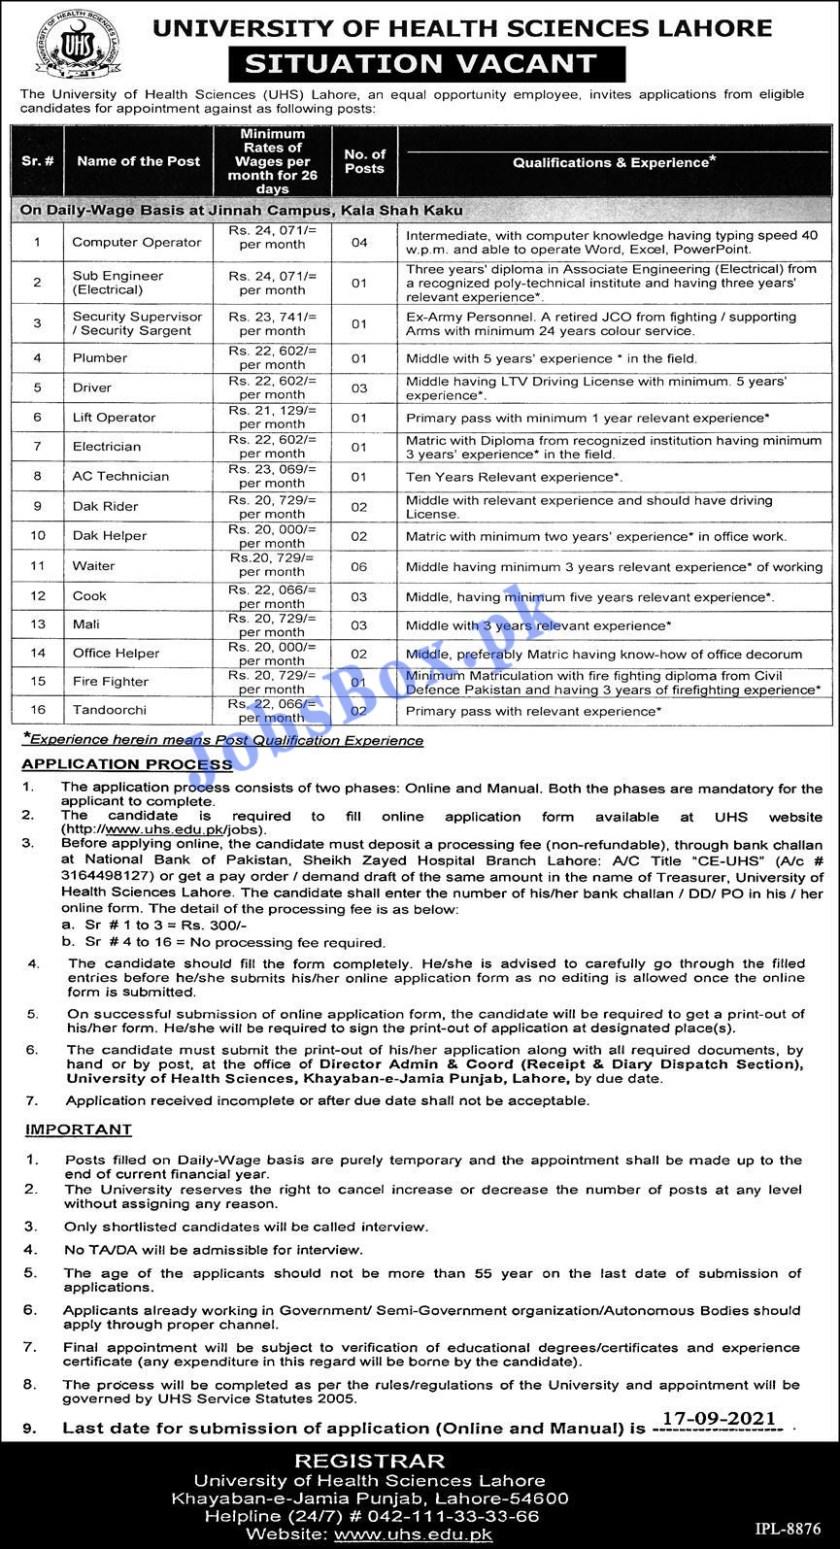 University of Health Sciences Kala Shah Kaku Campus Jobs 2021